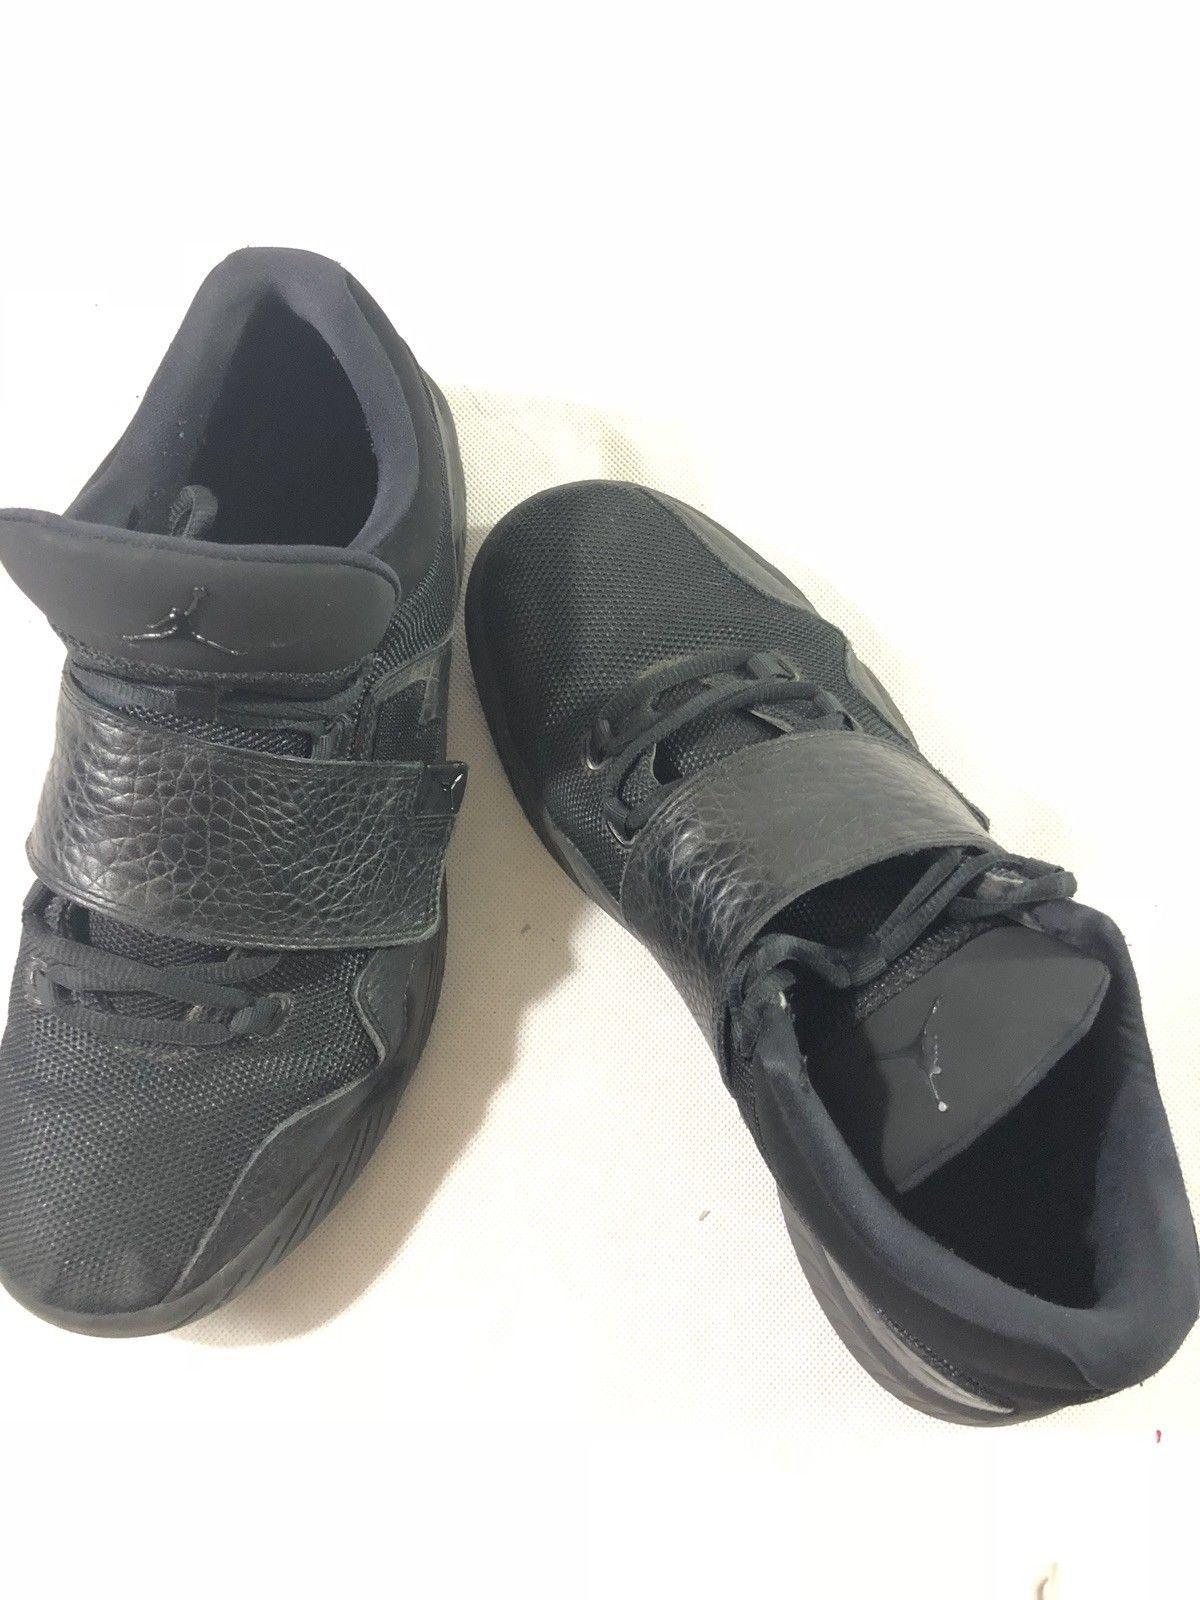 Nike Air Jordans 854557-001 Black 12 image 3